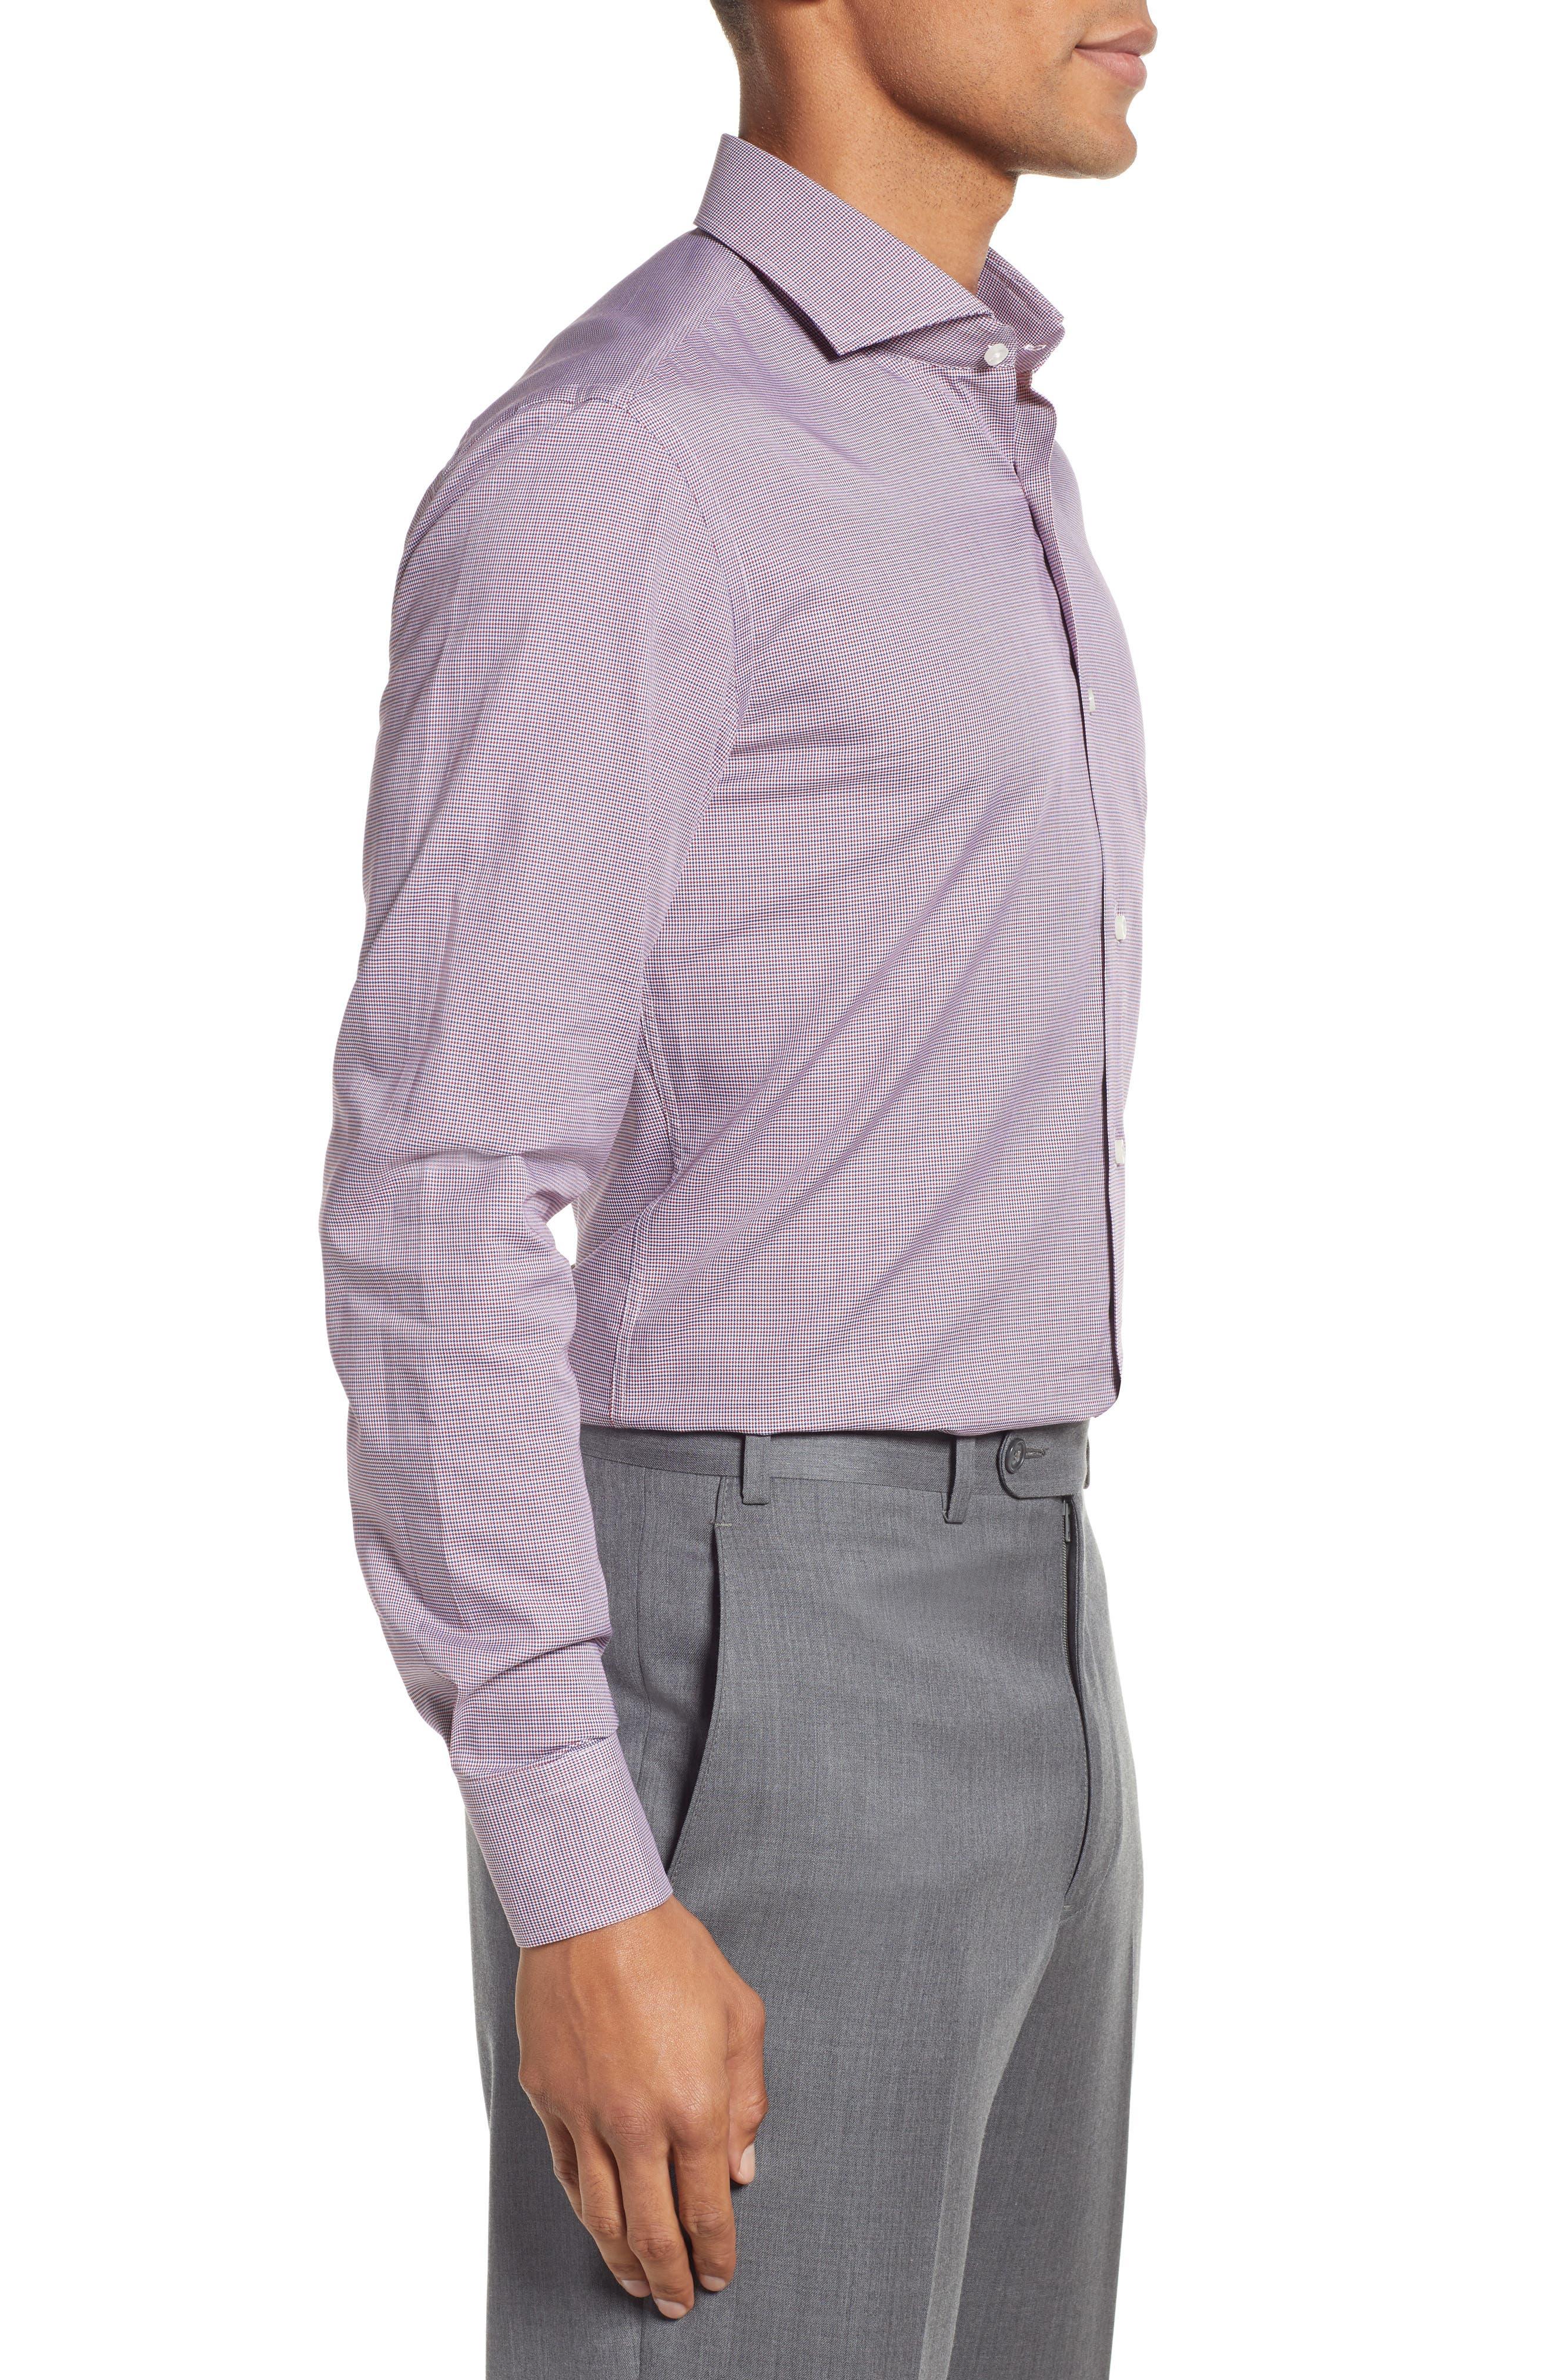 Jason Slim Fit Houndstooth Dress Shirt,                             Alternate thumbnail 4, color,                             RED